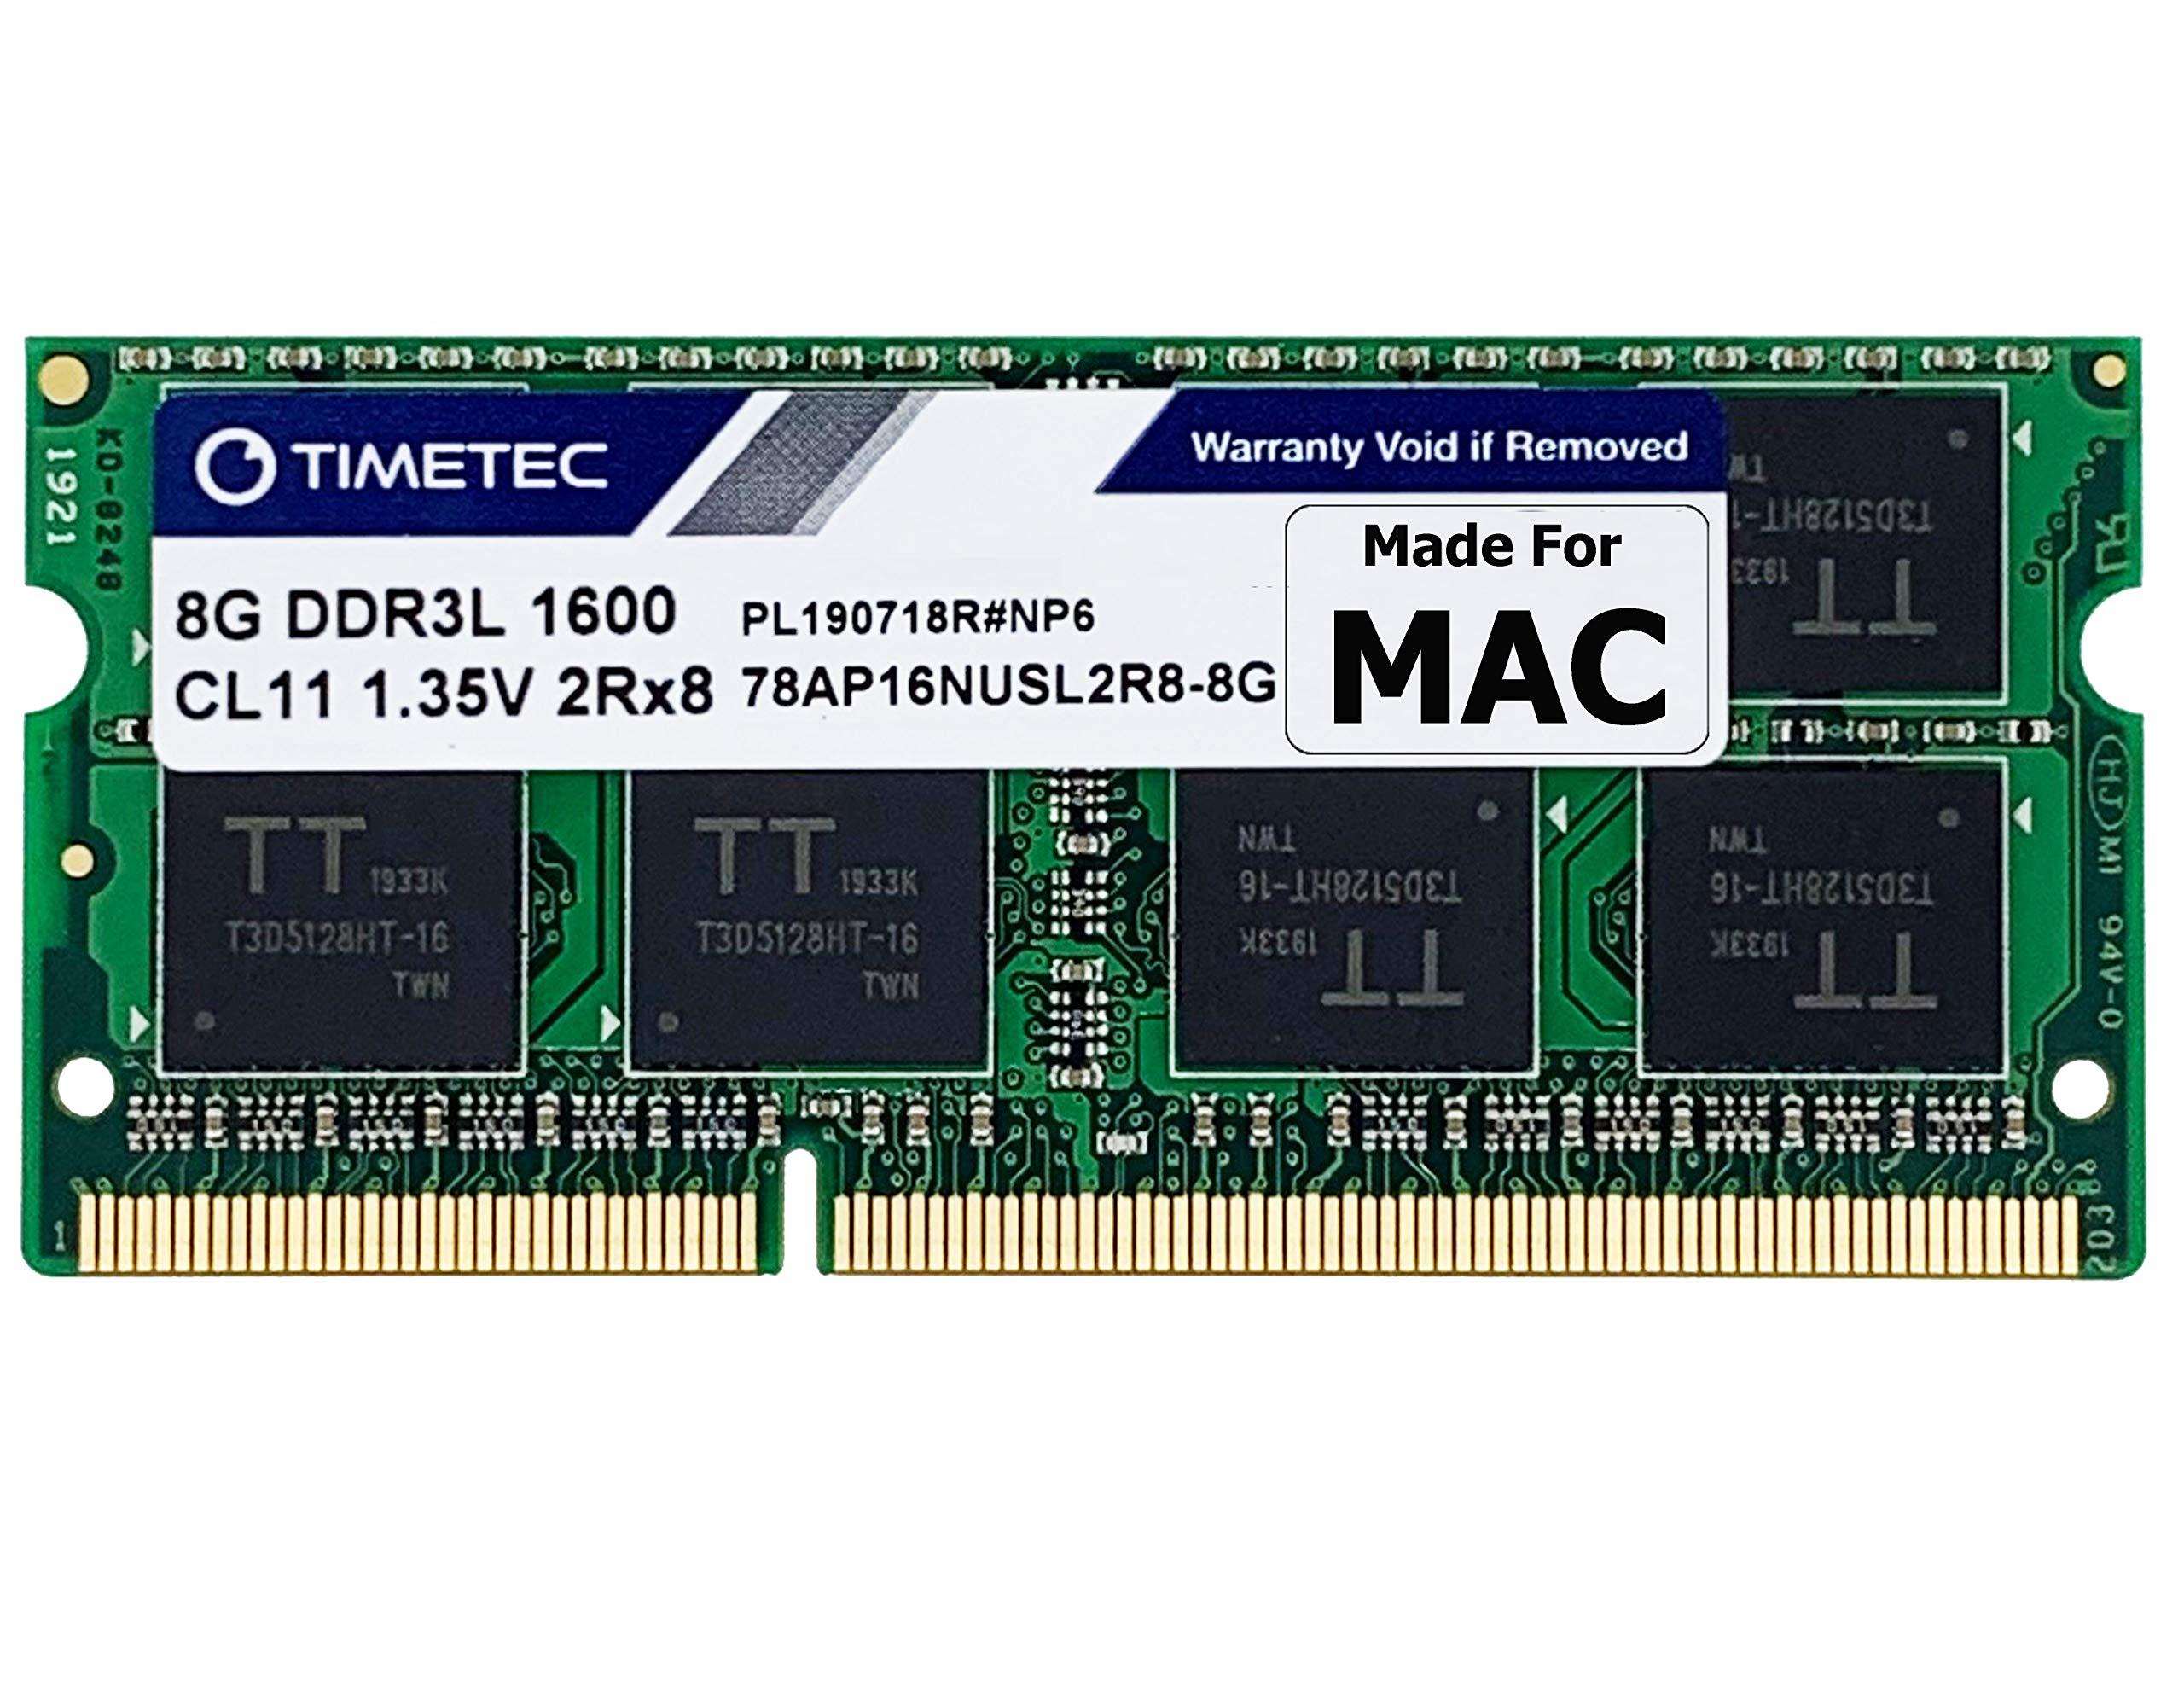 DDR3 1600MHz SODIMM PC3-12800 204-Pin Non-ECC Memory Upgrade Kit RAM for FUJITSU LIFEBOOK S762 2 x 8GB A-Tech 16GB